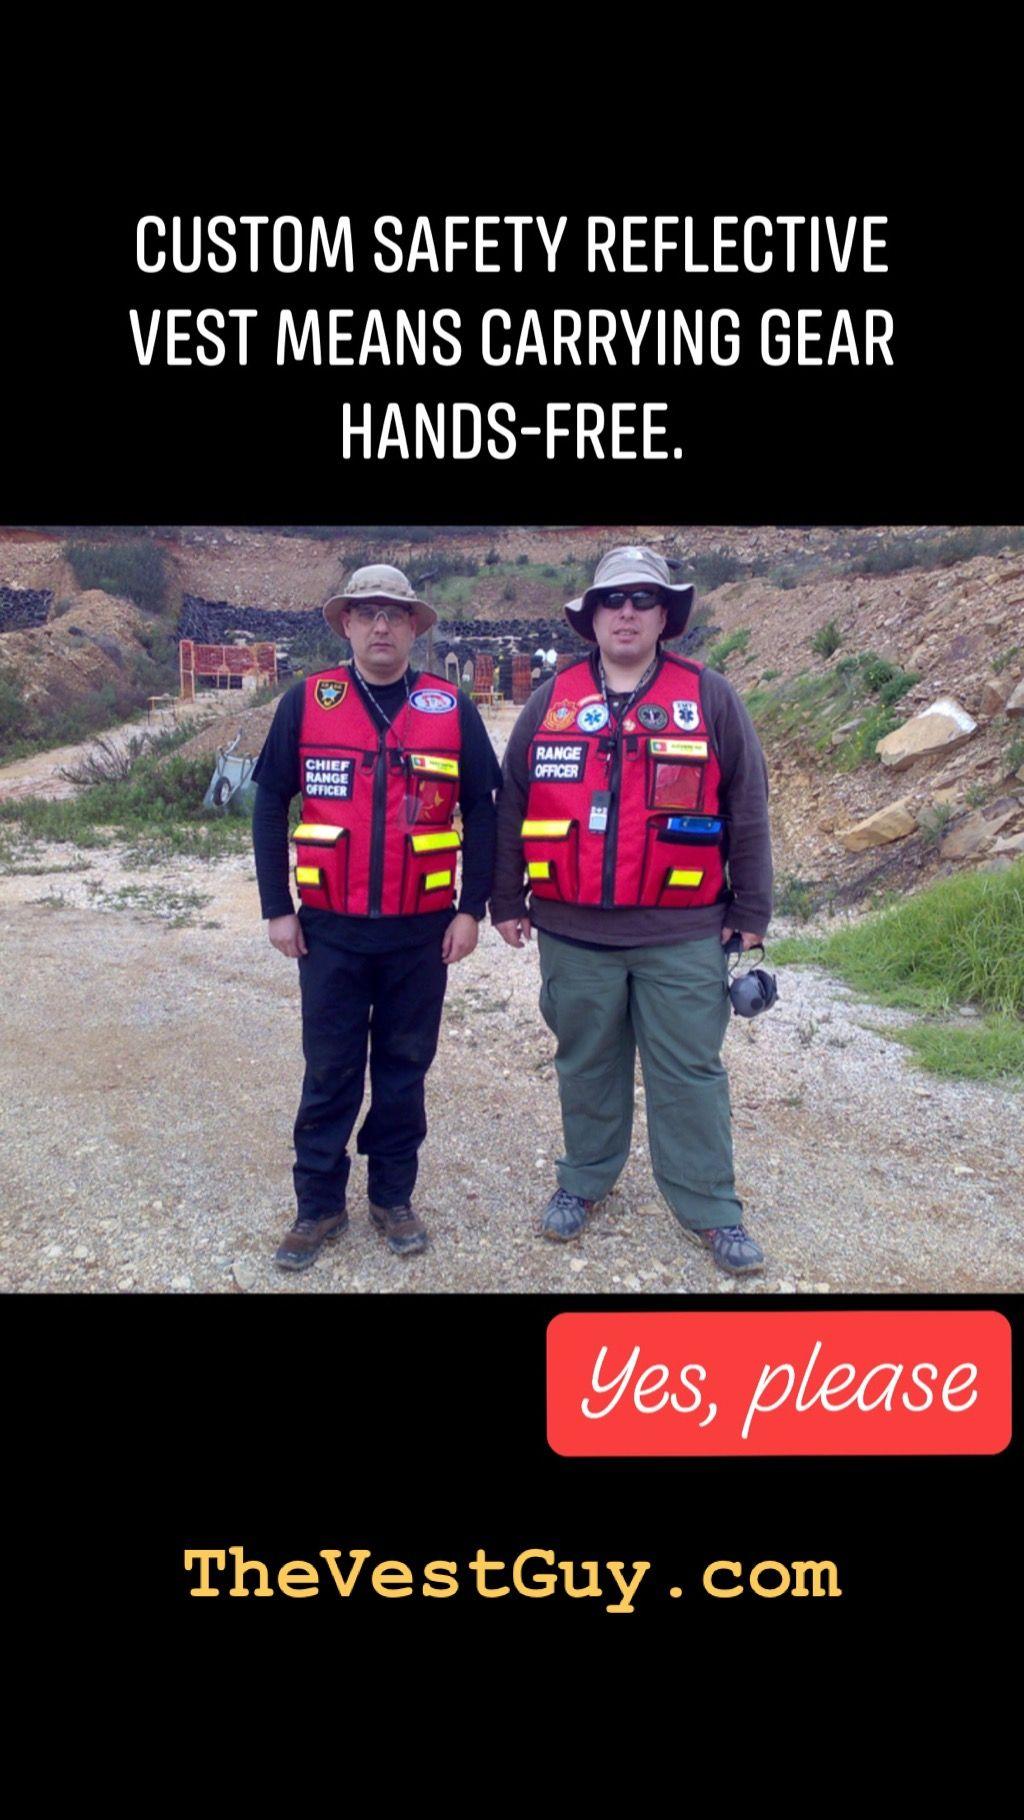 Custom range officer reflective vest by the vest guy